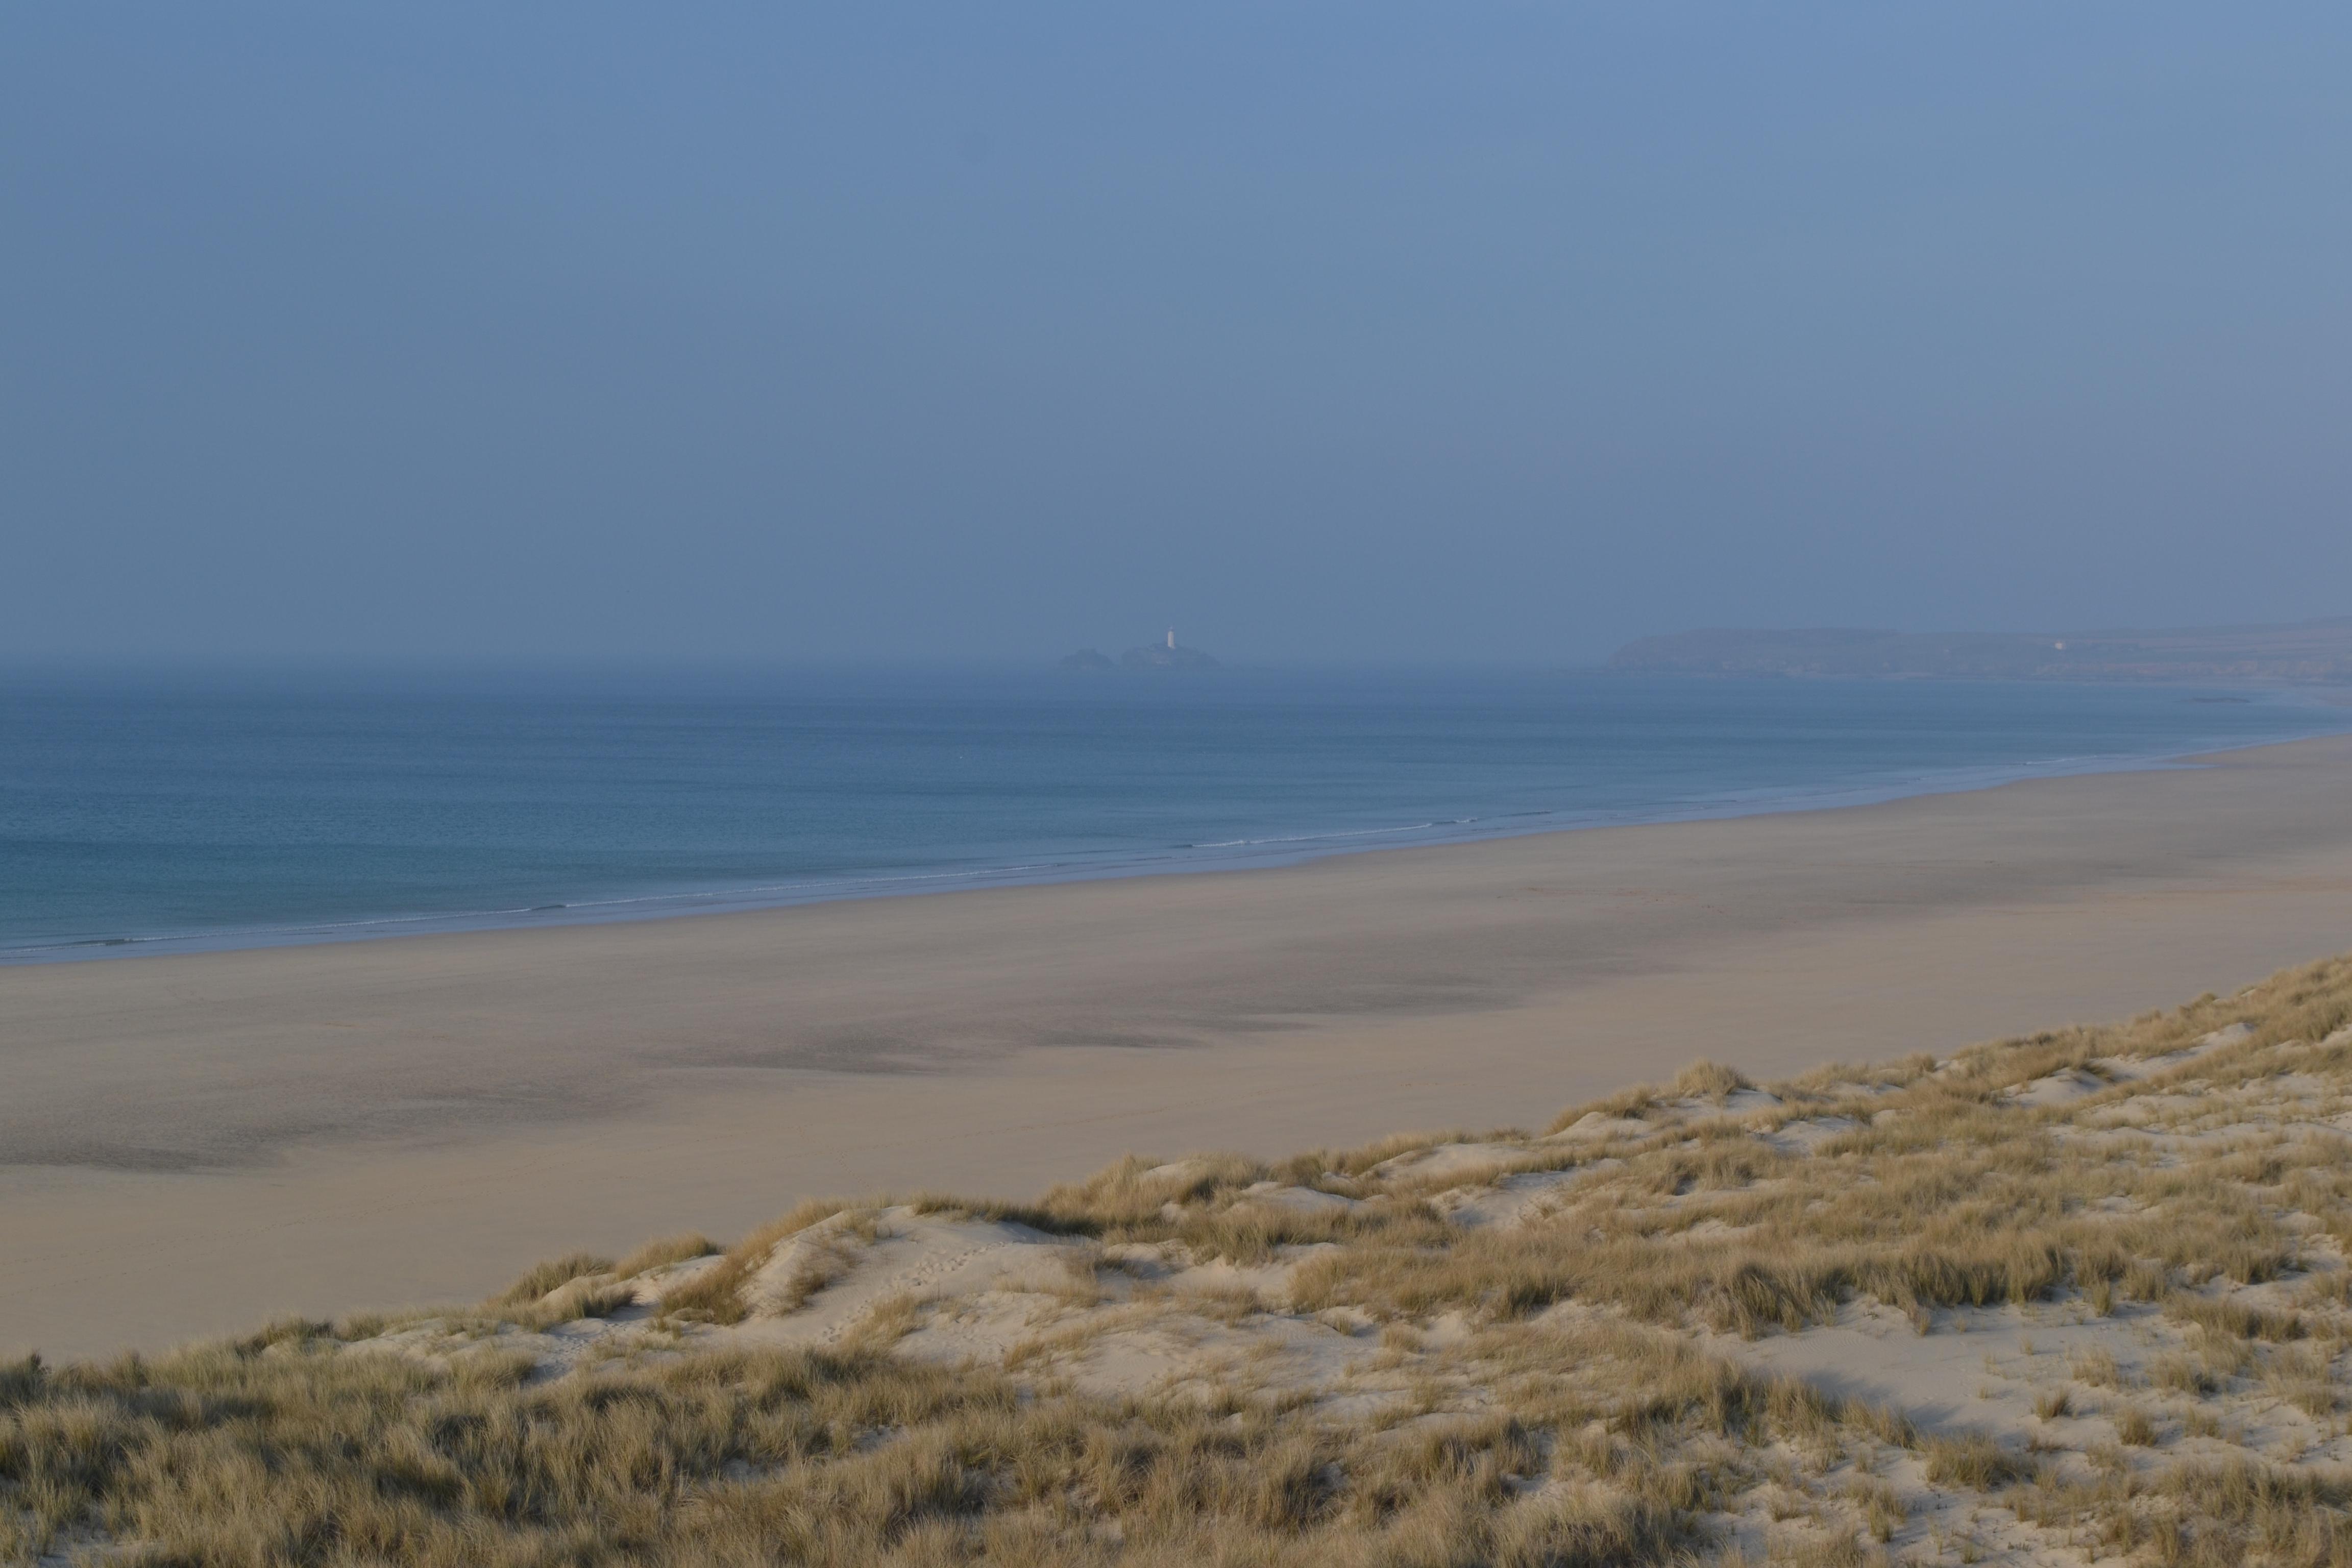 Godrevy beach and island